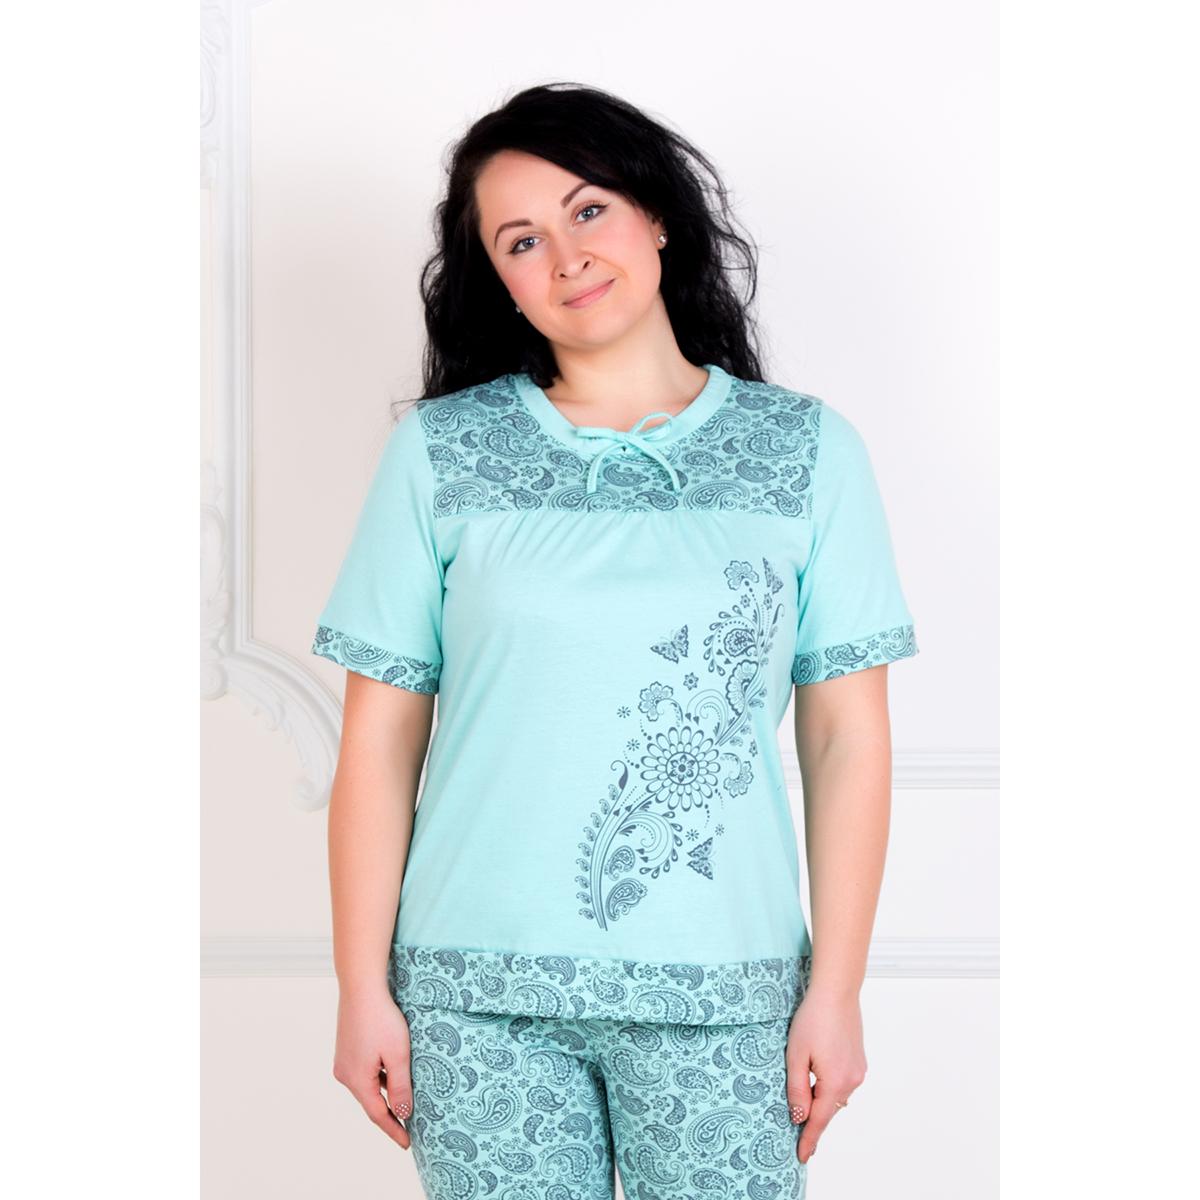 Женский пижама Норма, размер 50Пижамы<br>Обхват груди:100 см<br>Обхват талии:82 см<br>Обхват бедер:108 см<br>Рост:167 см<br><br>Тип: Жен. костюм<br>Размер: 50<br>Материал: Кулирка